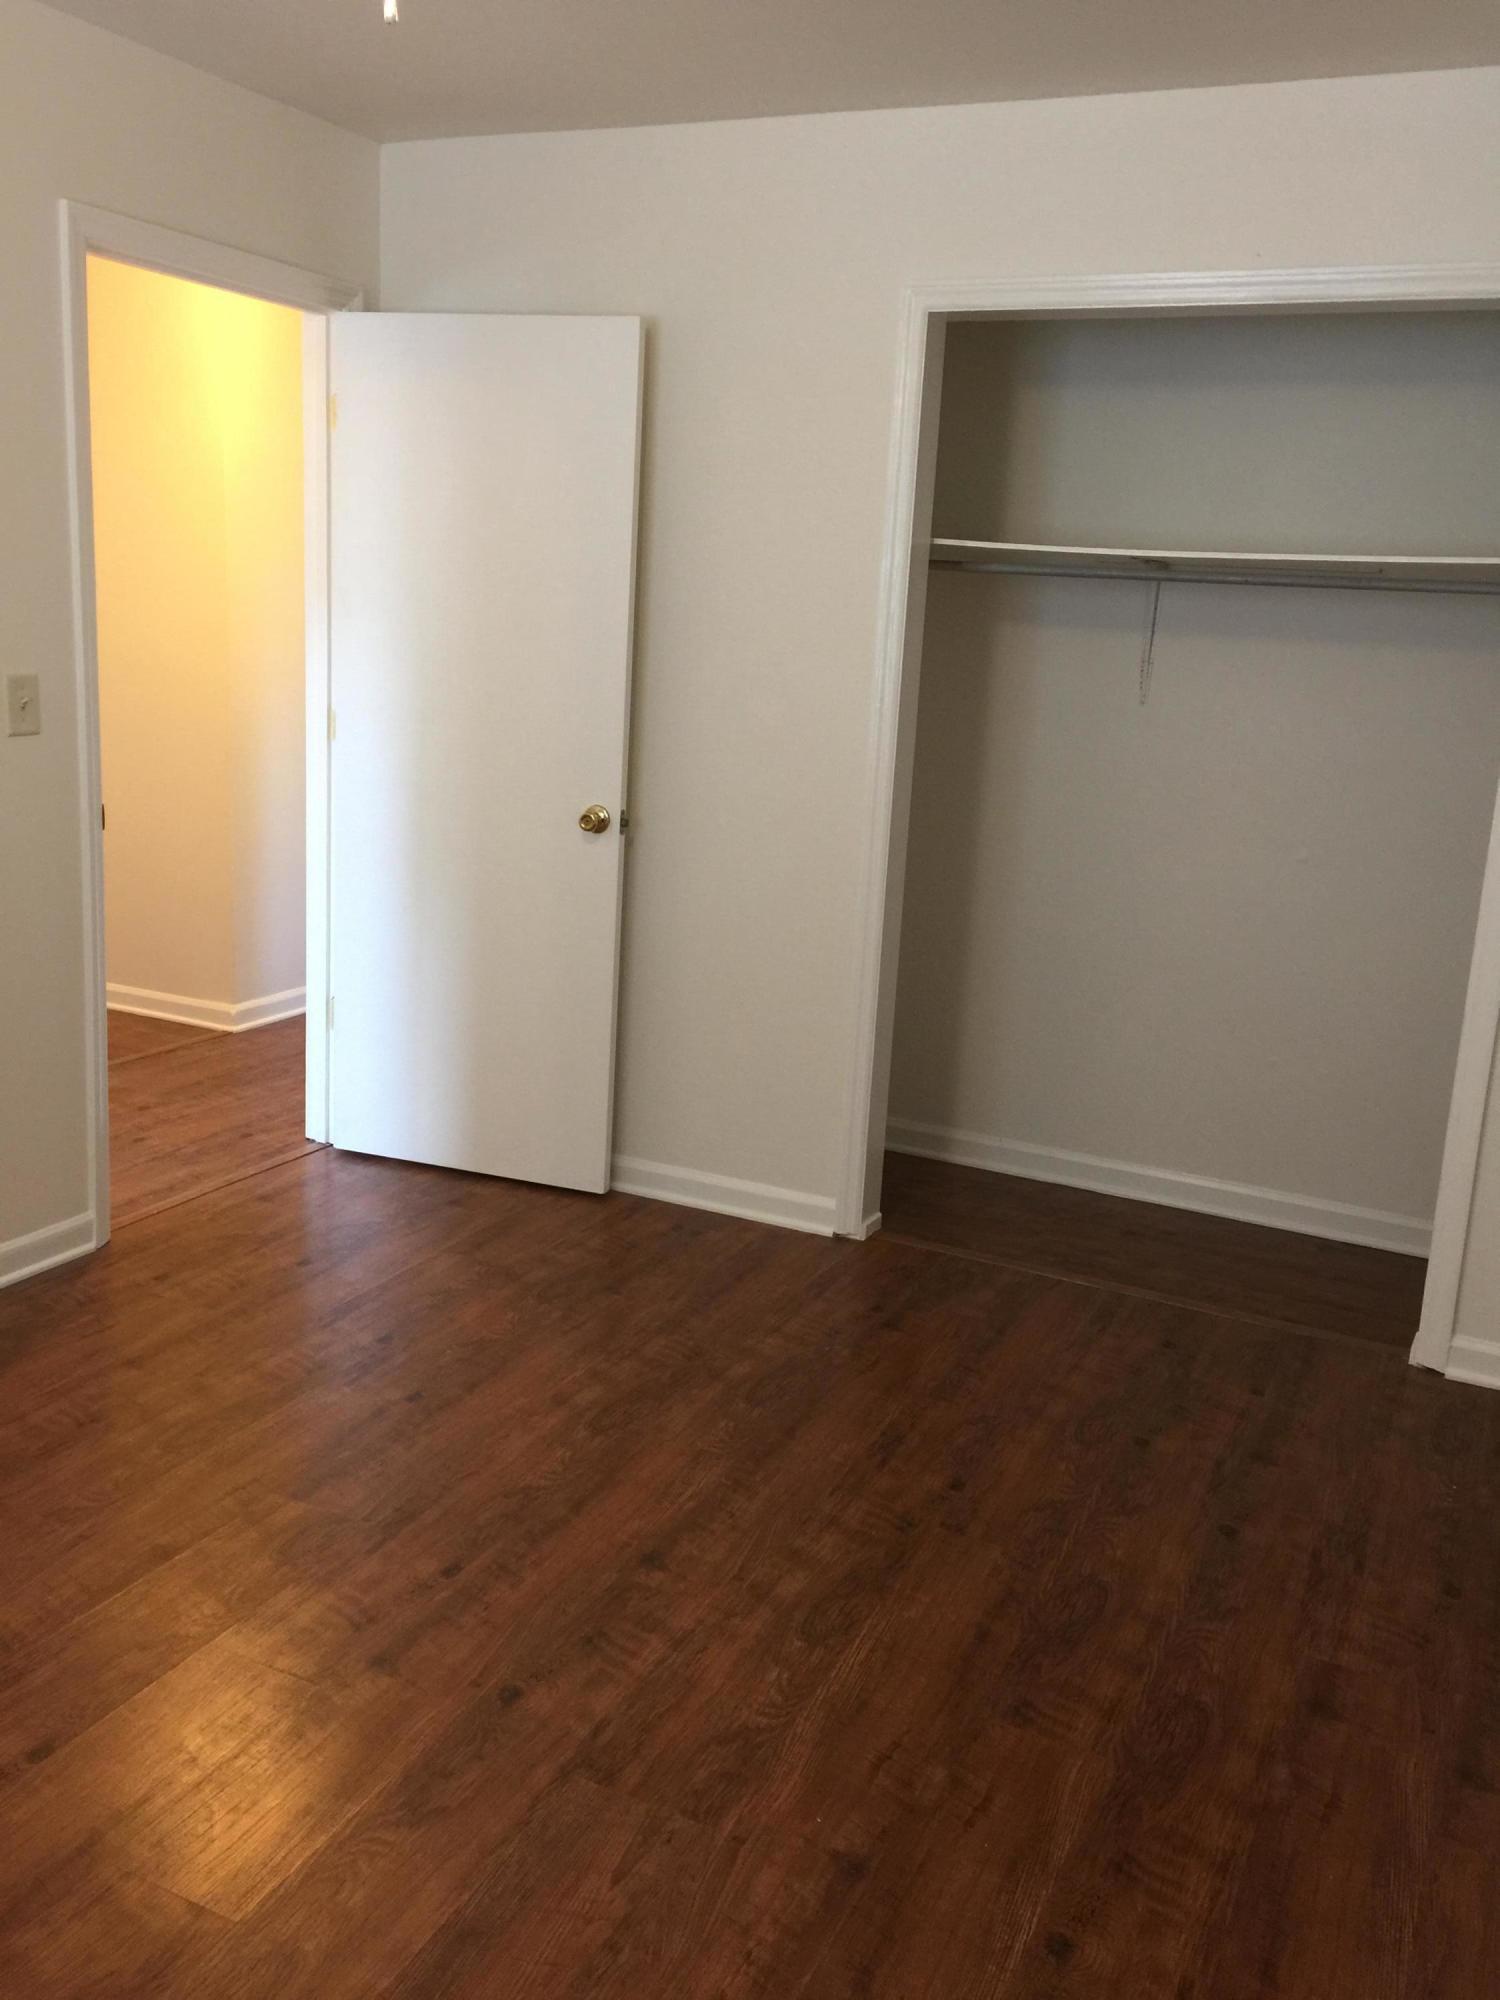 Quail Run Homes For Sale - 1202 Chicorie, Charleston, SC - 17